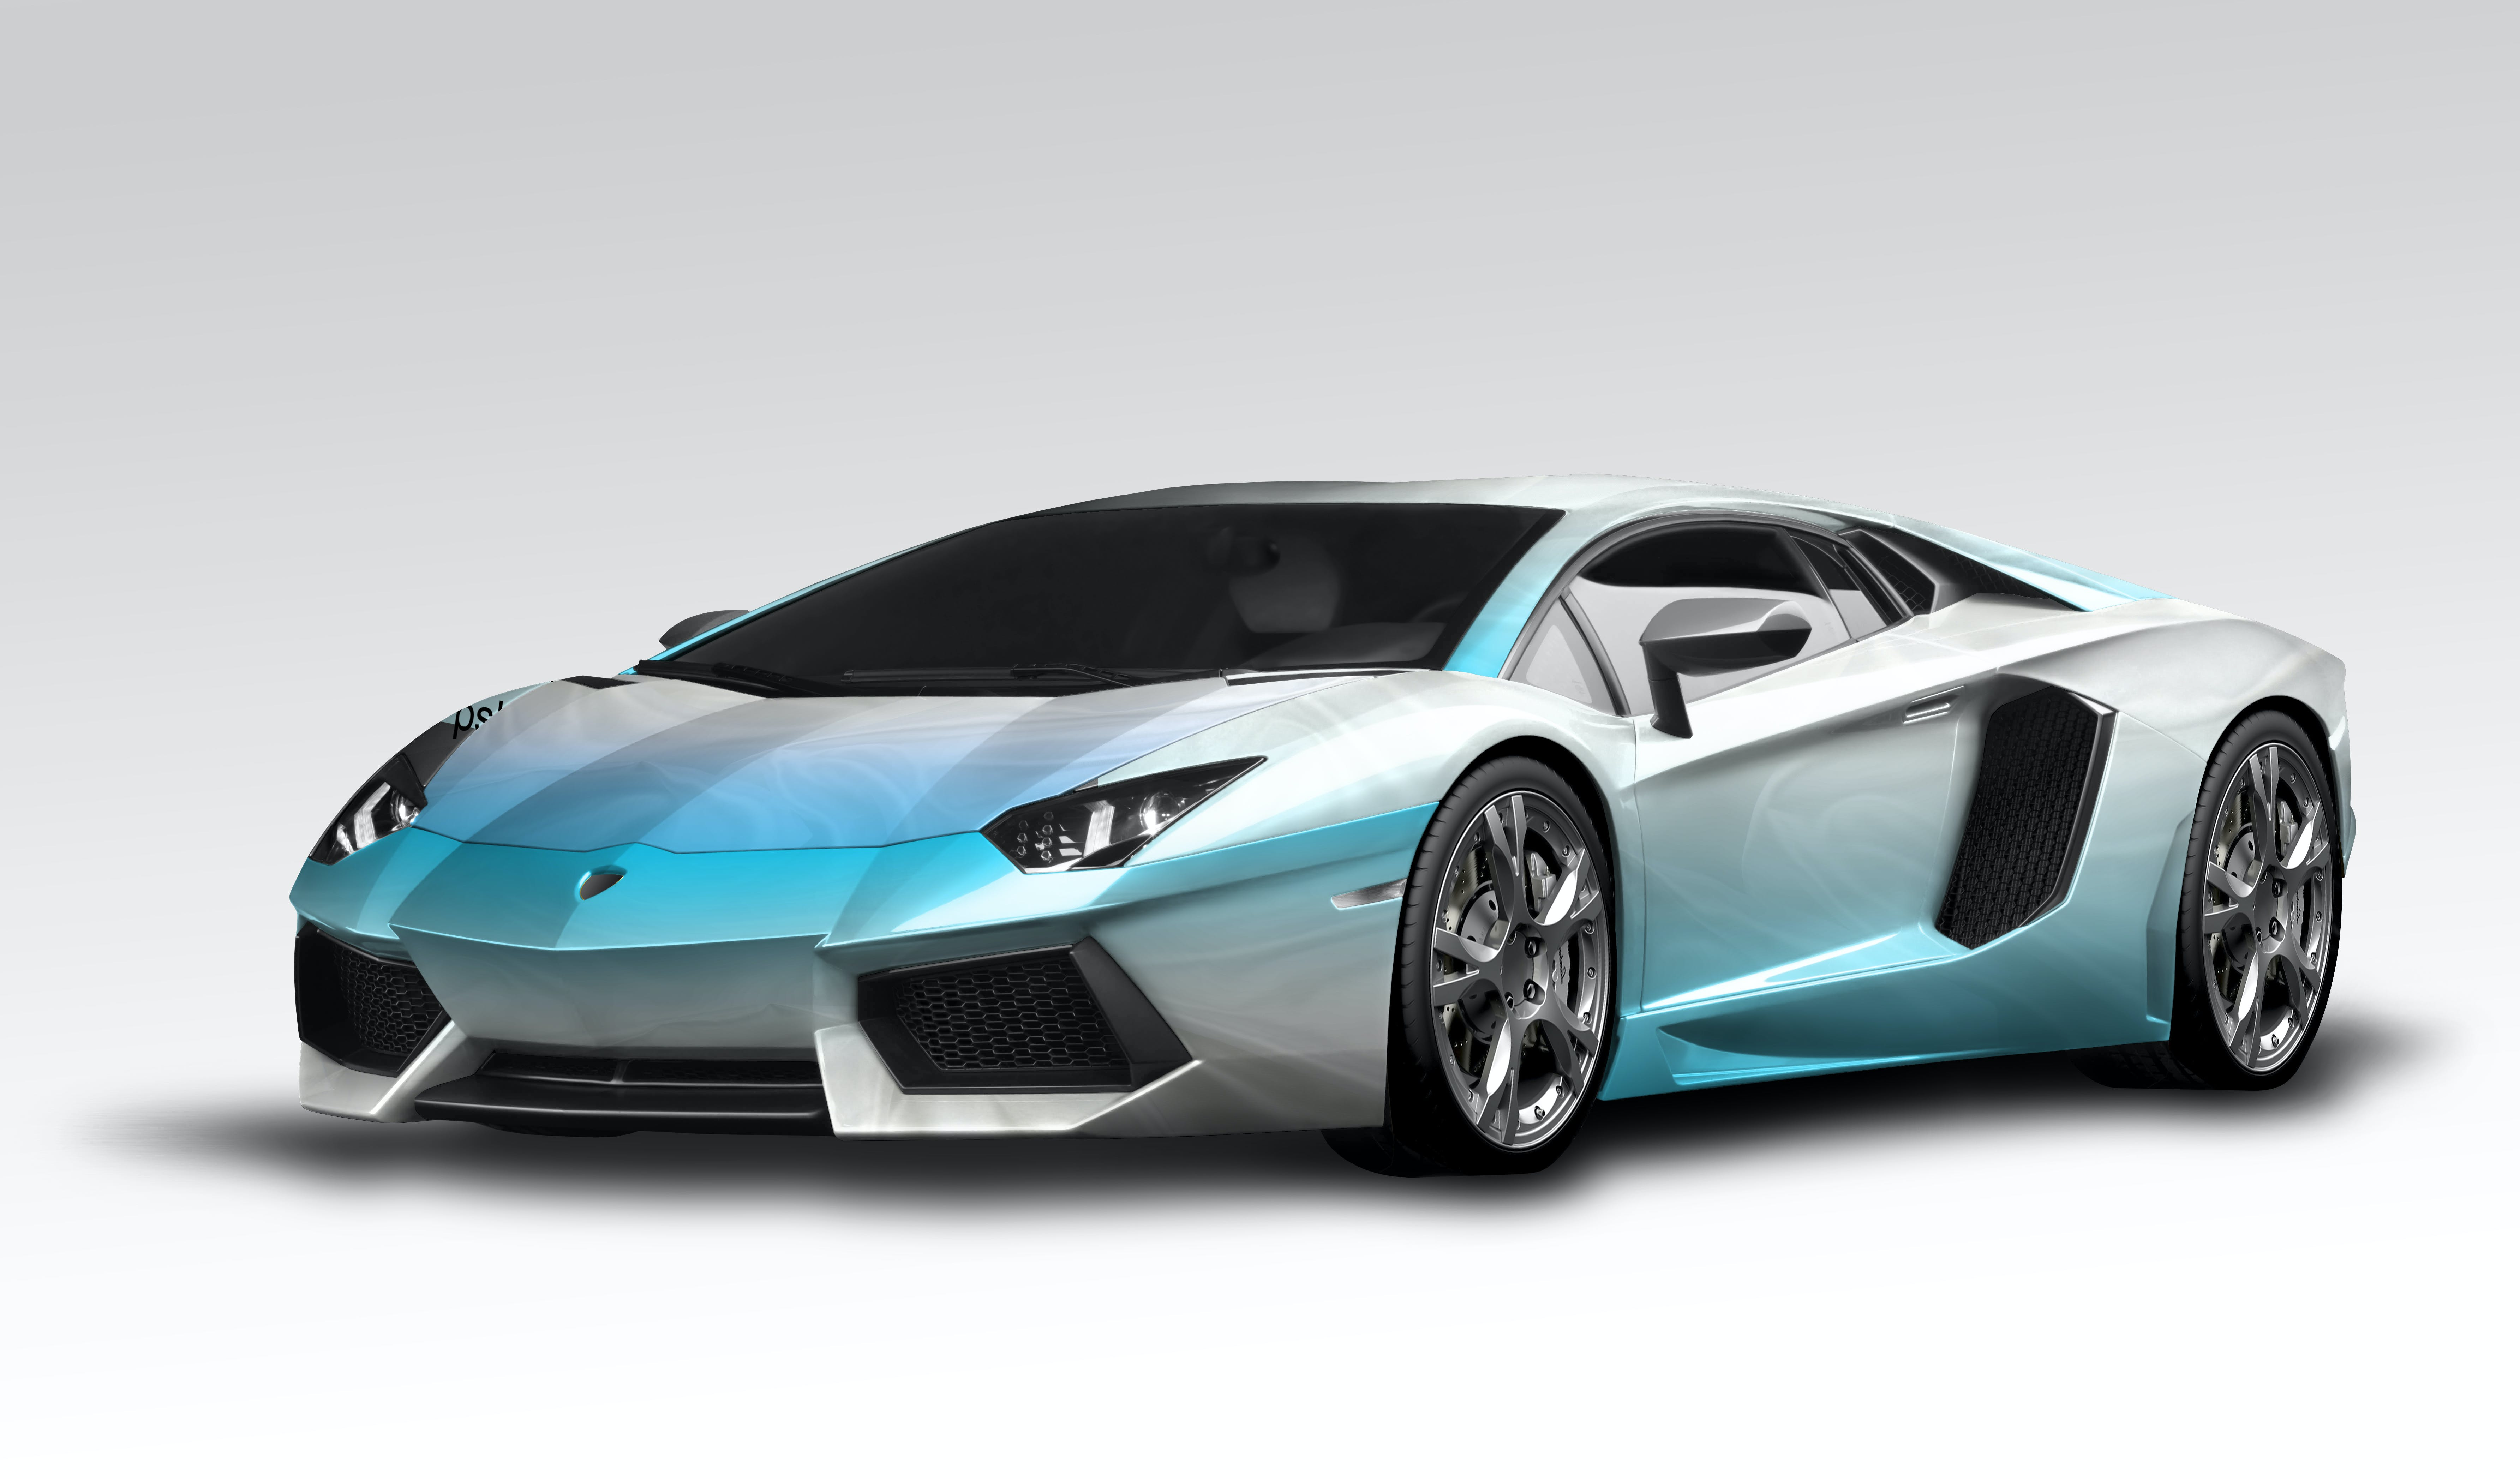 Free stock photo of car, cars, Lamborghini Aventador, luxury car